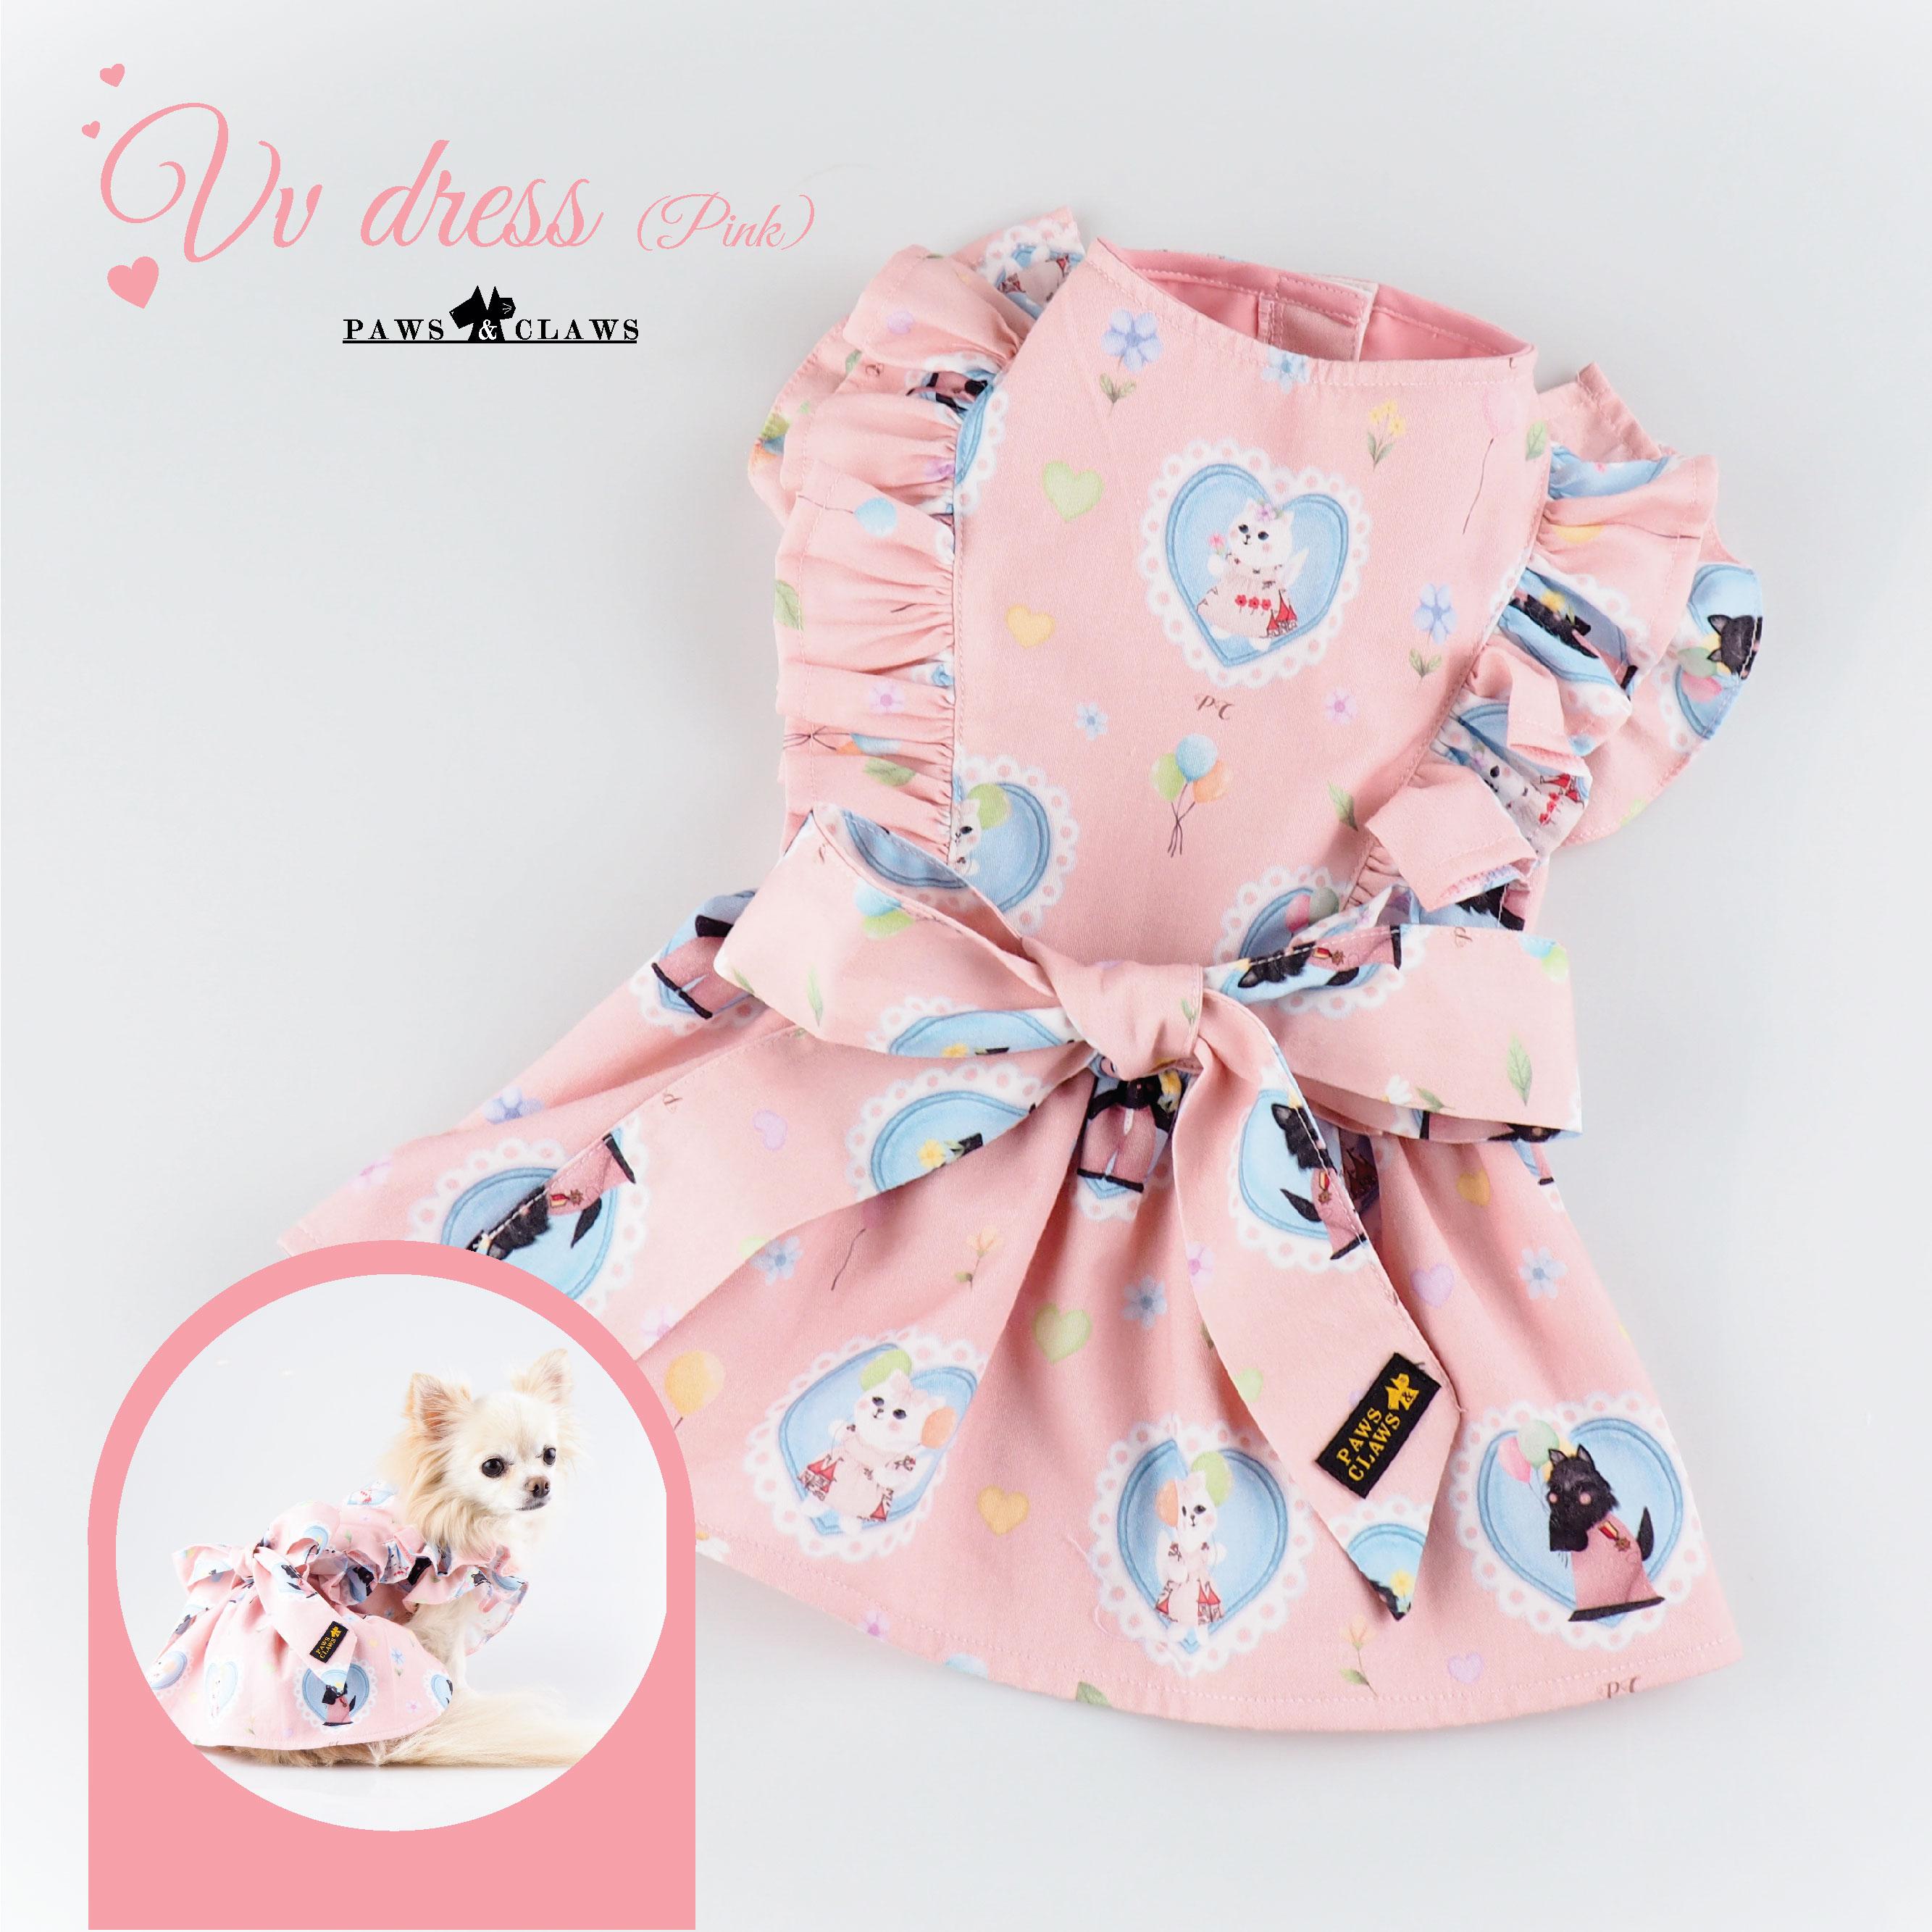 VV dress (Pink)